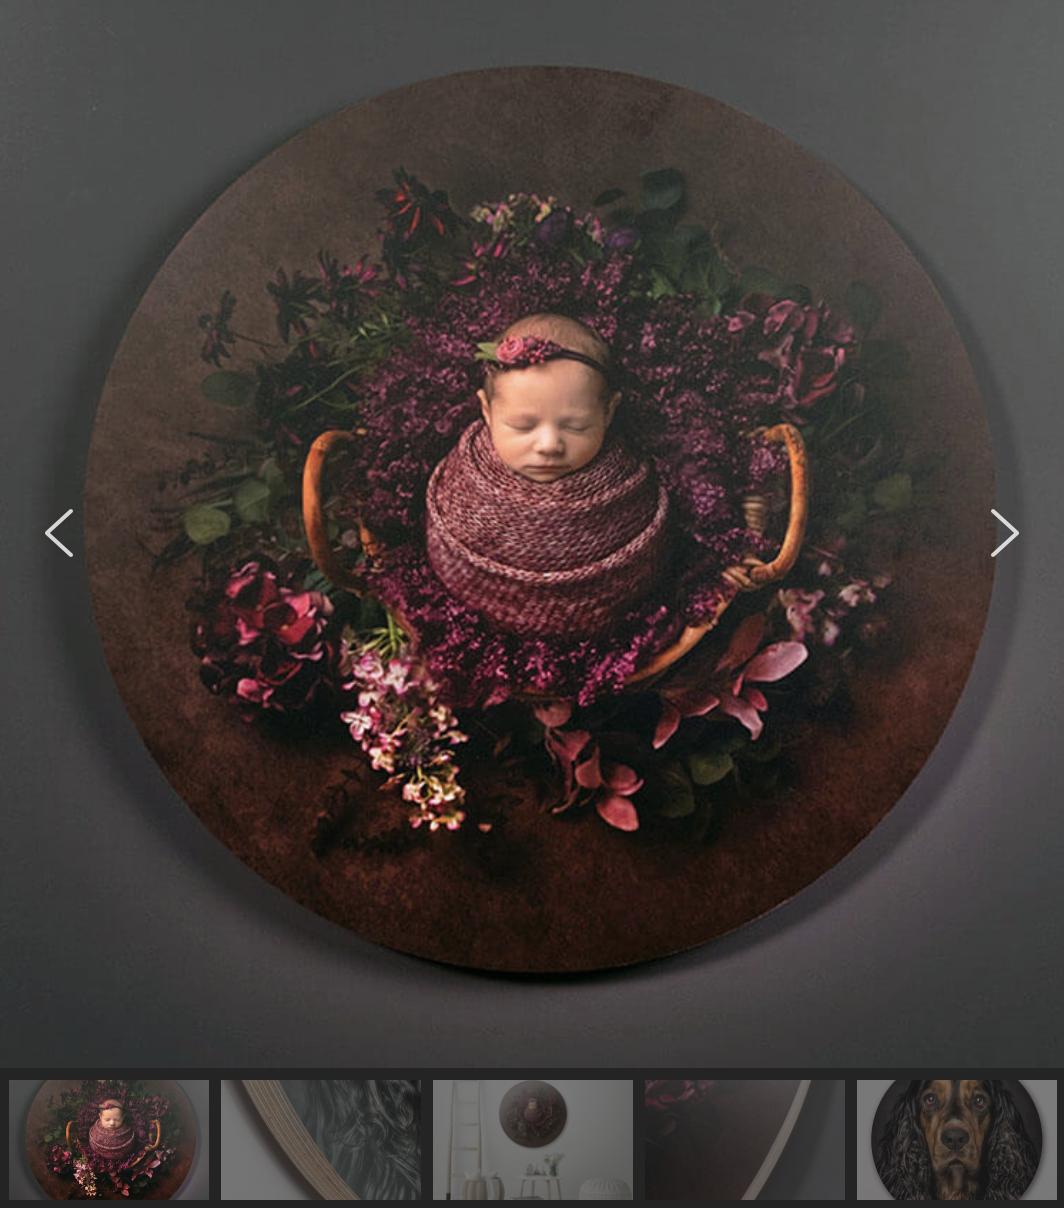 "Newborn Session products: 20"" Birch Sphere"